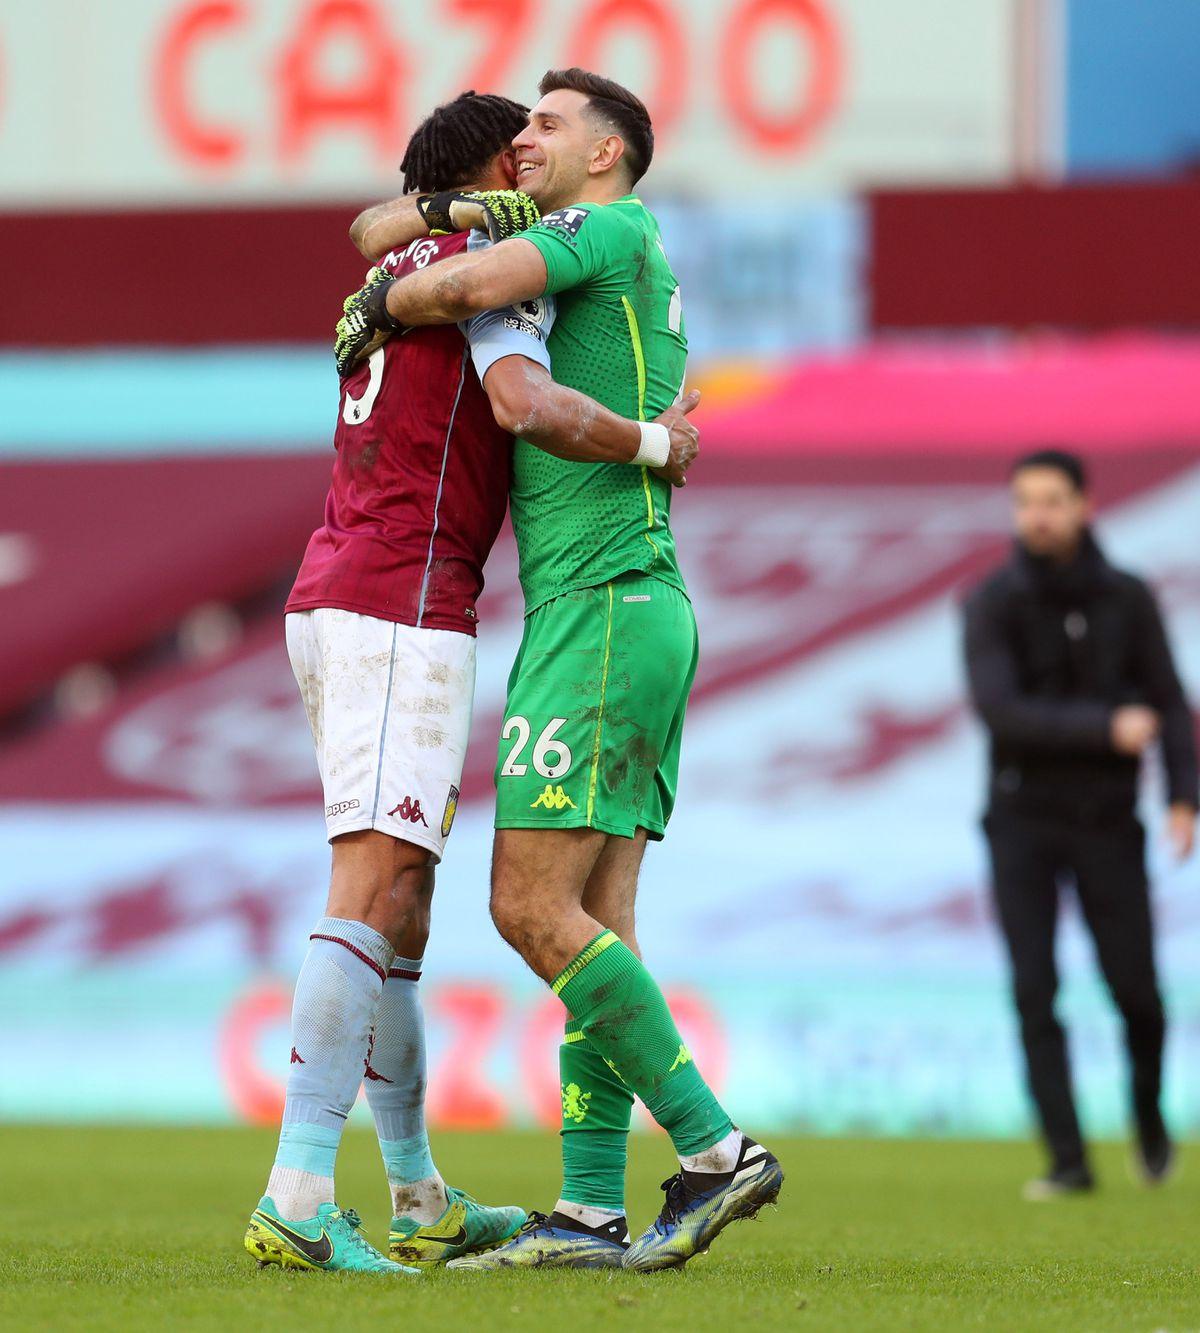 Aston Villa's Tyrone Mings celebrates with goalkeeper Emiliano Martinez following Saturday's win over Arsenal.